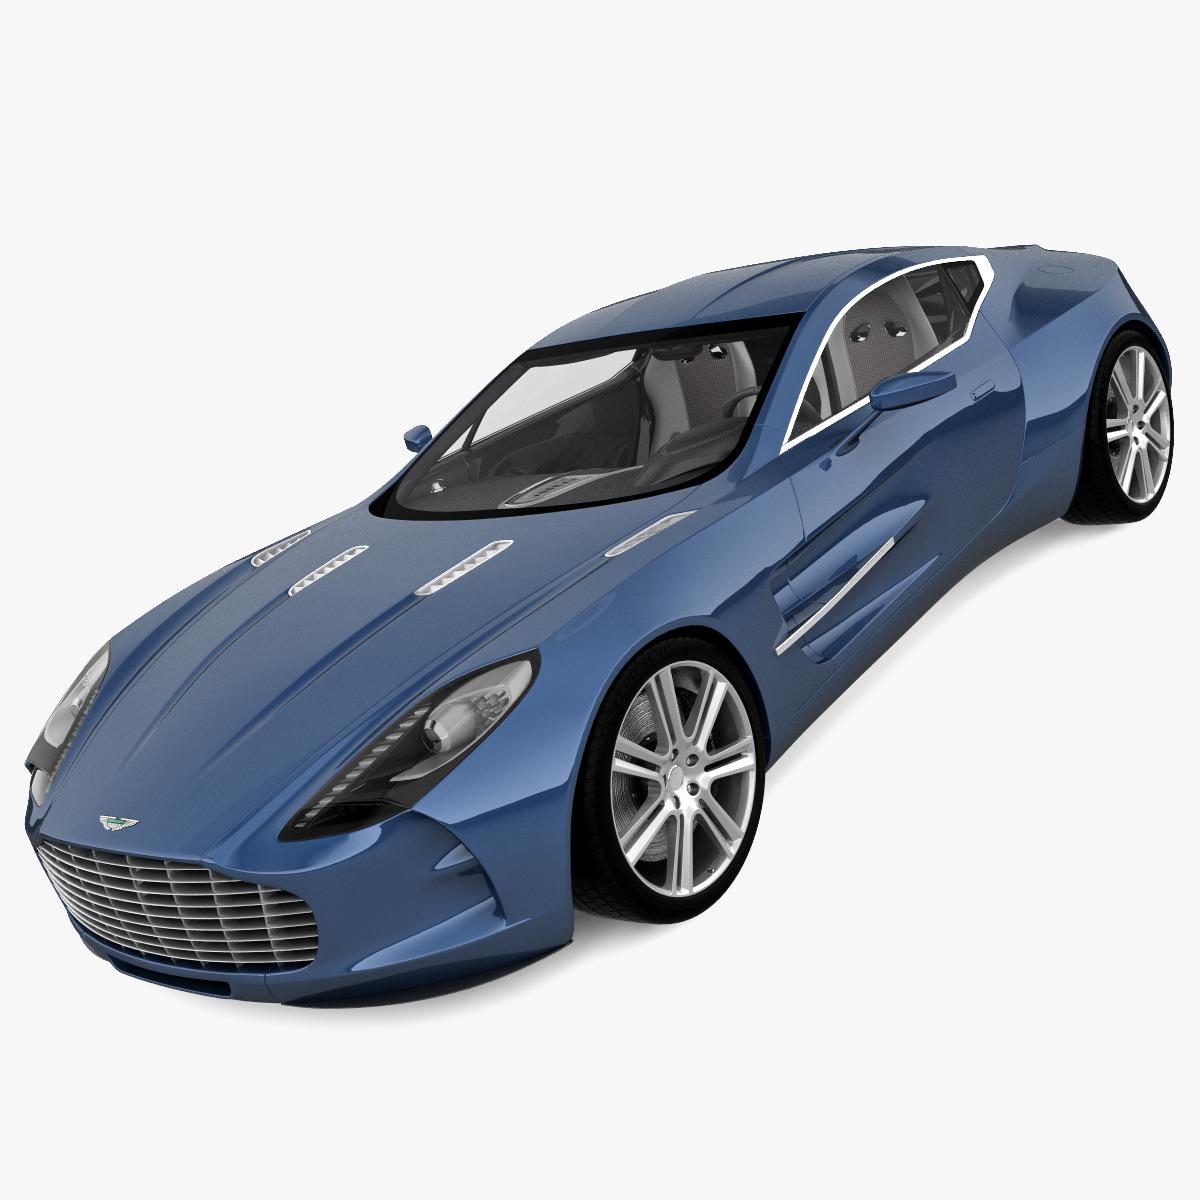 Aston_Martin_One_77_00.jpg